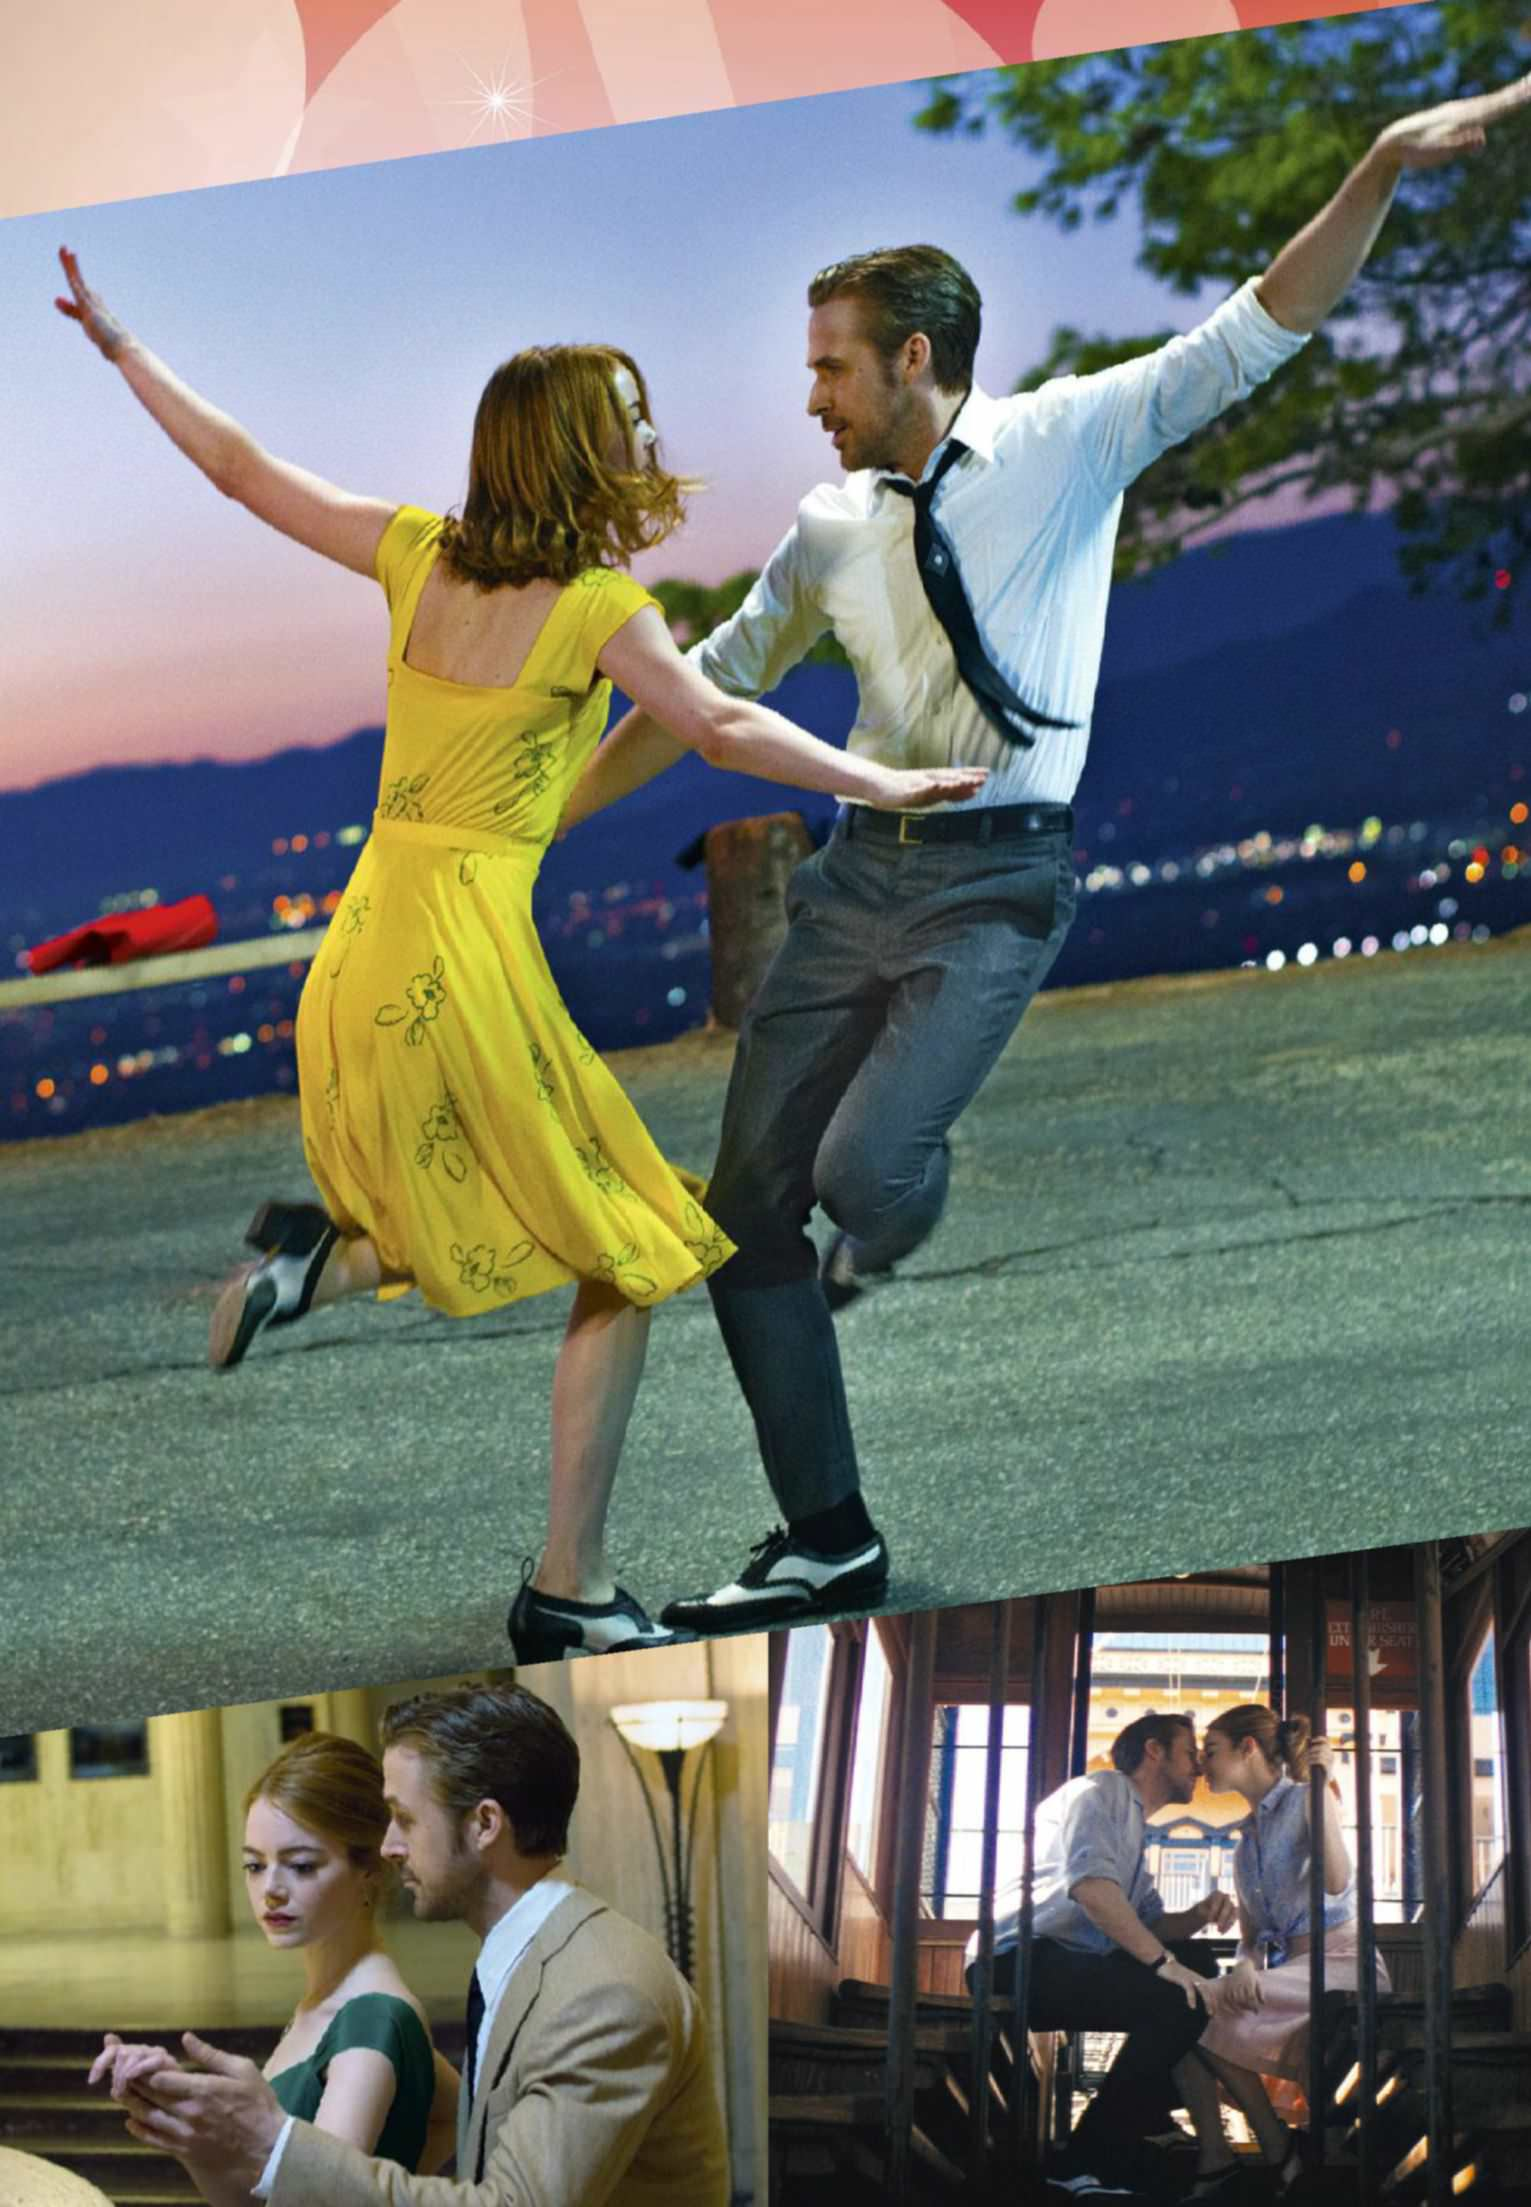 shall we dance - photo #13